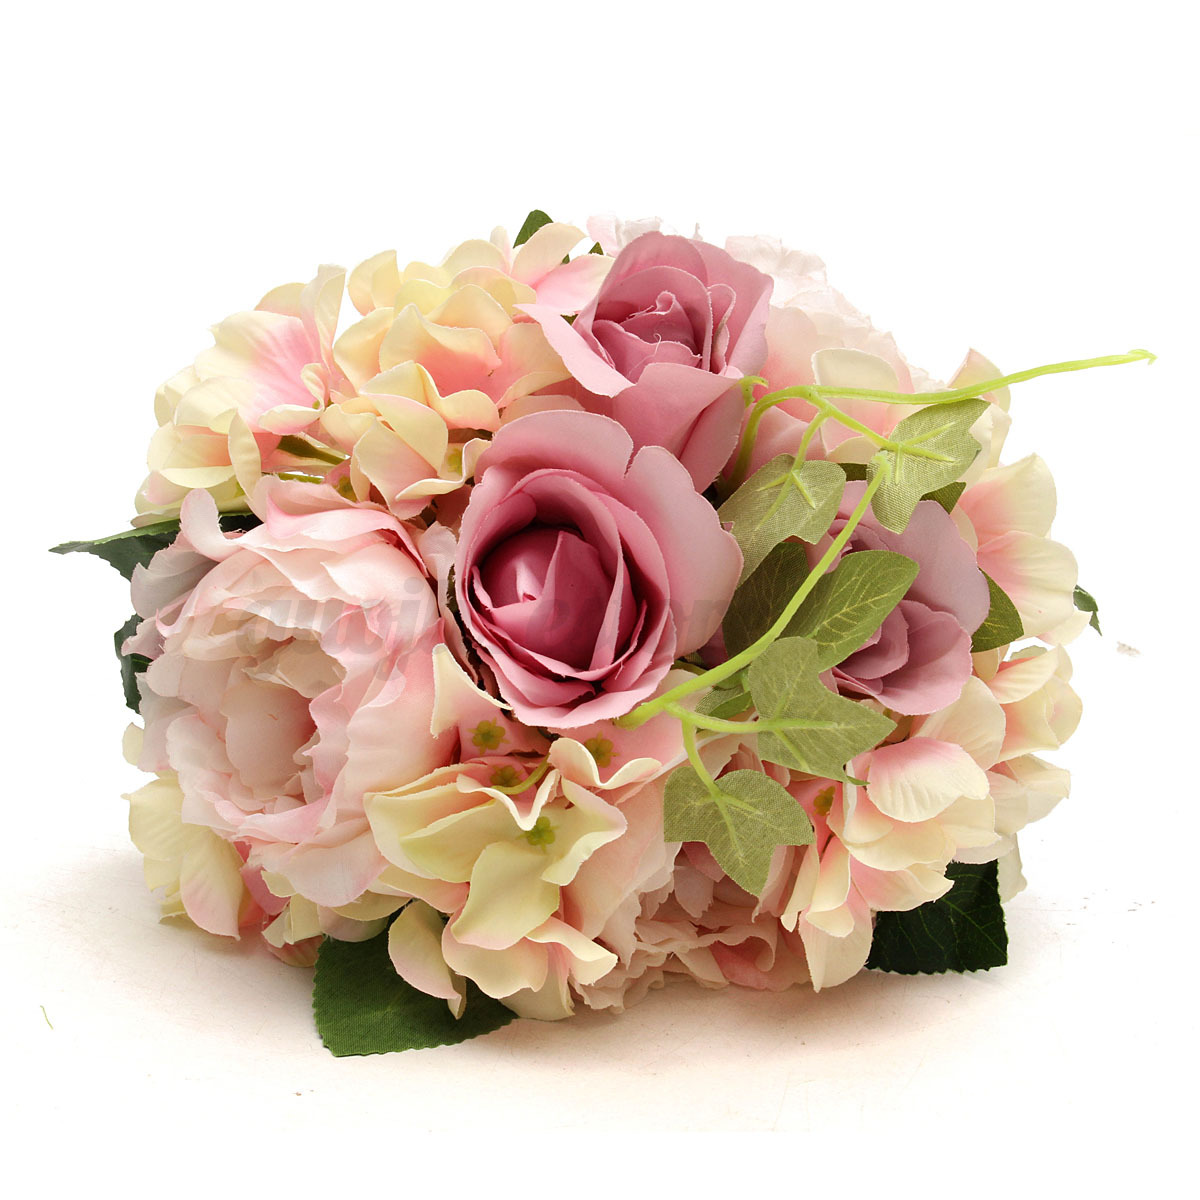 Artificial rose bridal bridesmaid flowers hand bouquet wedding party artificial rose bridal bridesmaid flowers hand bouquet wedding izmirmasajfo